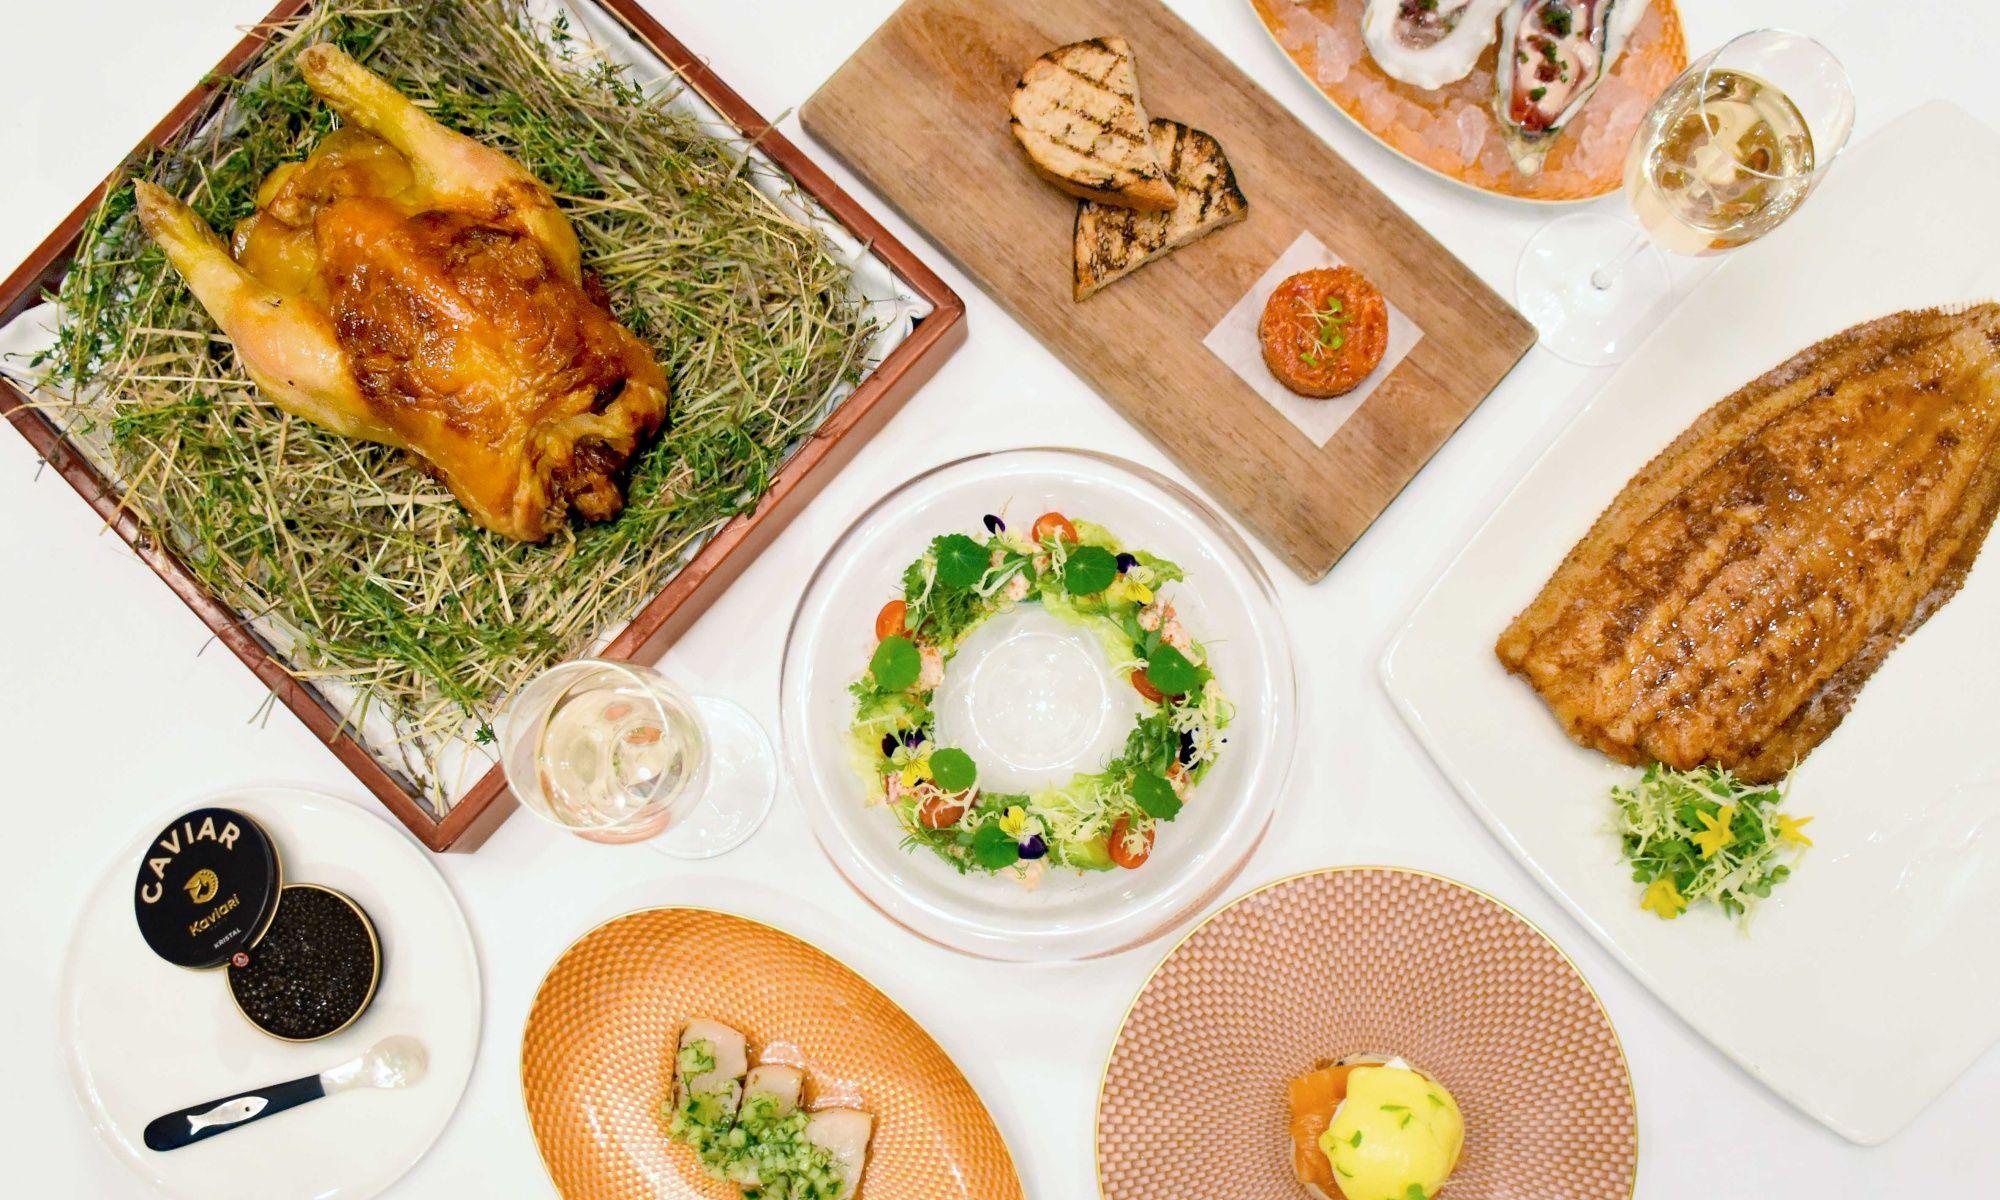 Mandarin Grill Celebrates The Weekend With Sunday Roast